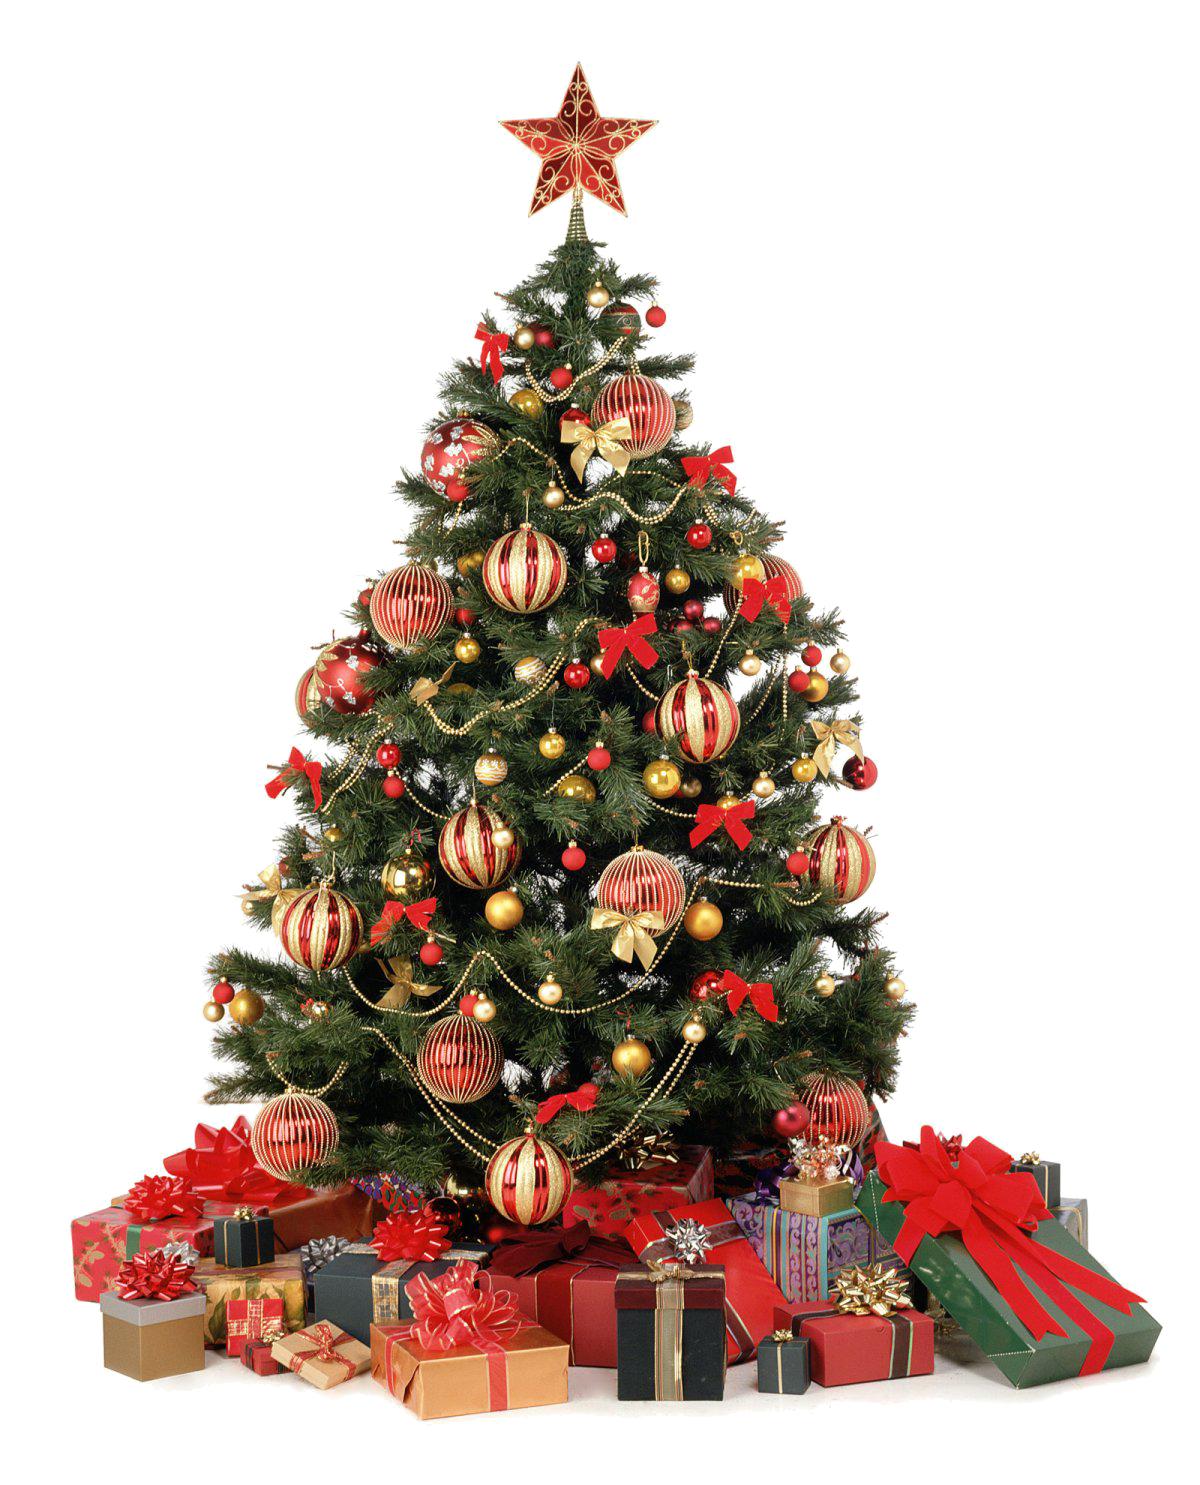 Christmas home clipart jpg royalty free stock Christmas Home PNG Clipart | PNG Mart jpg royalty free stock